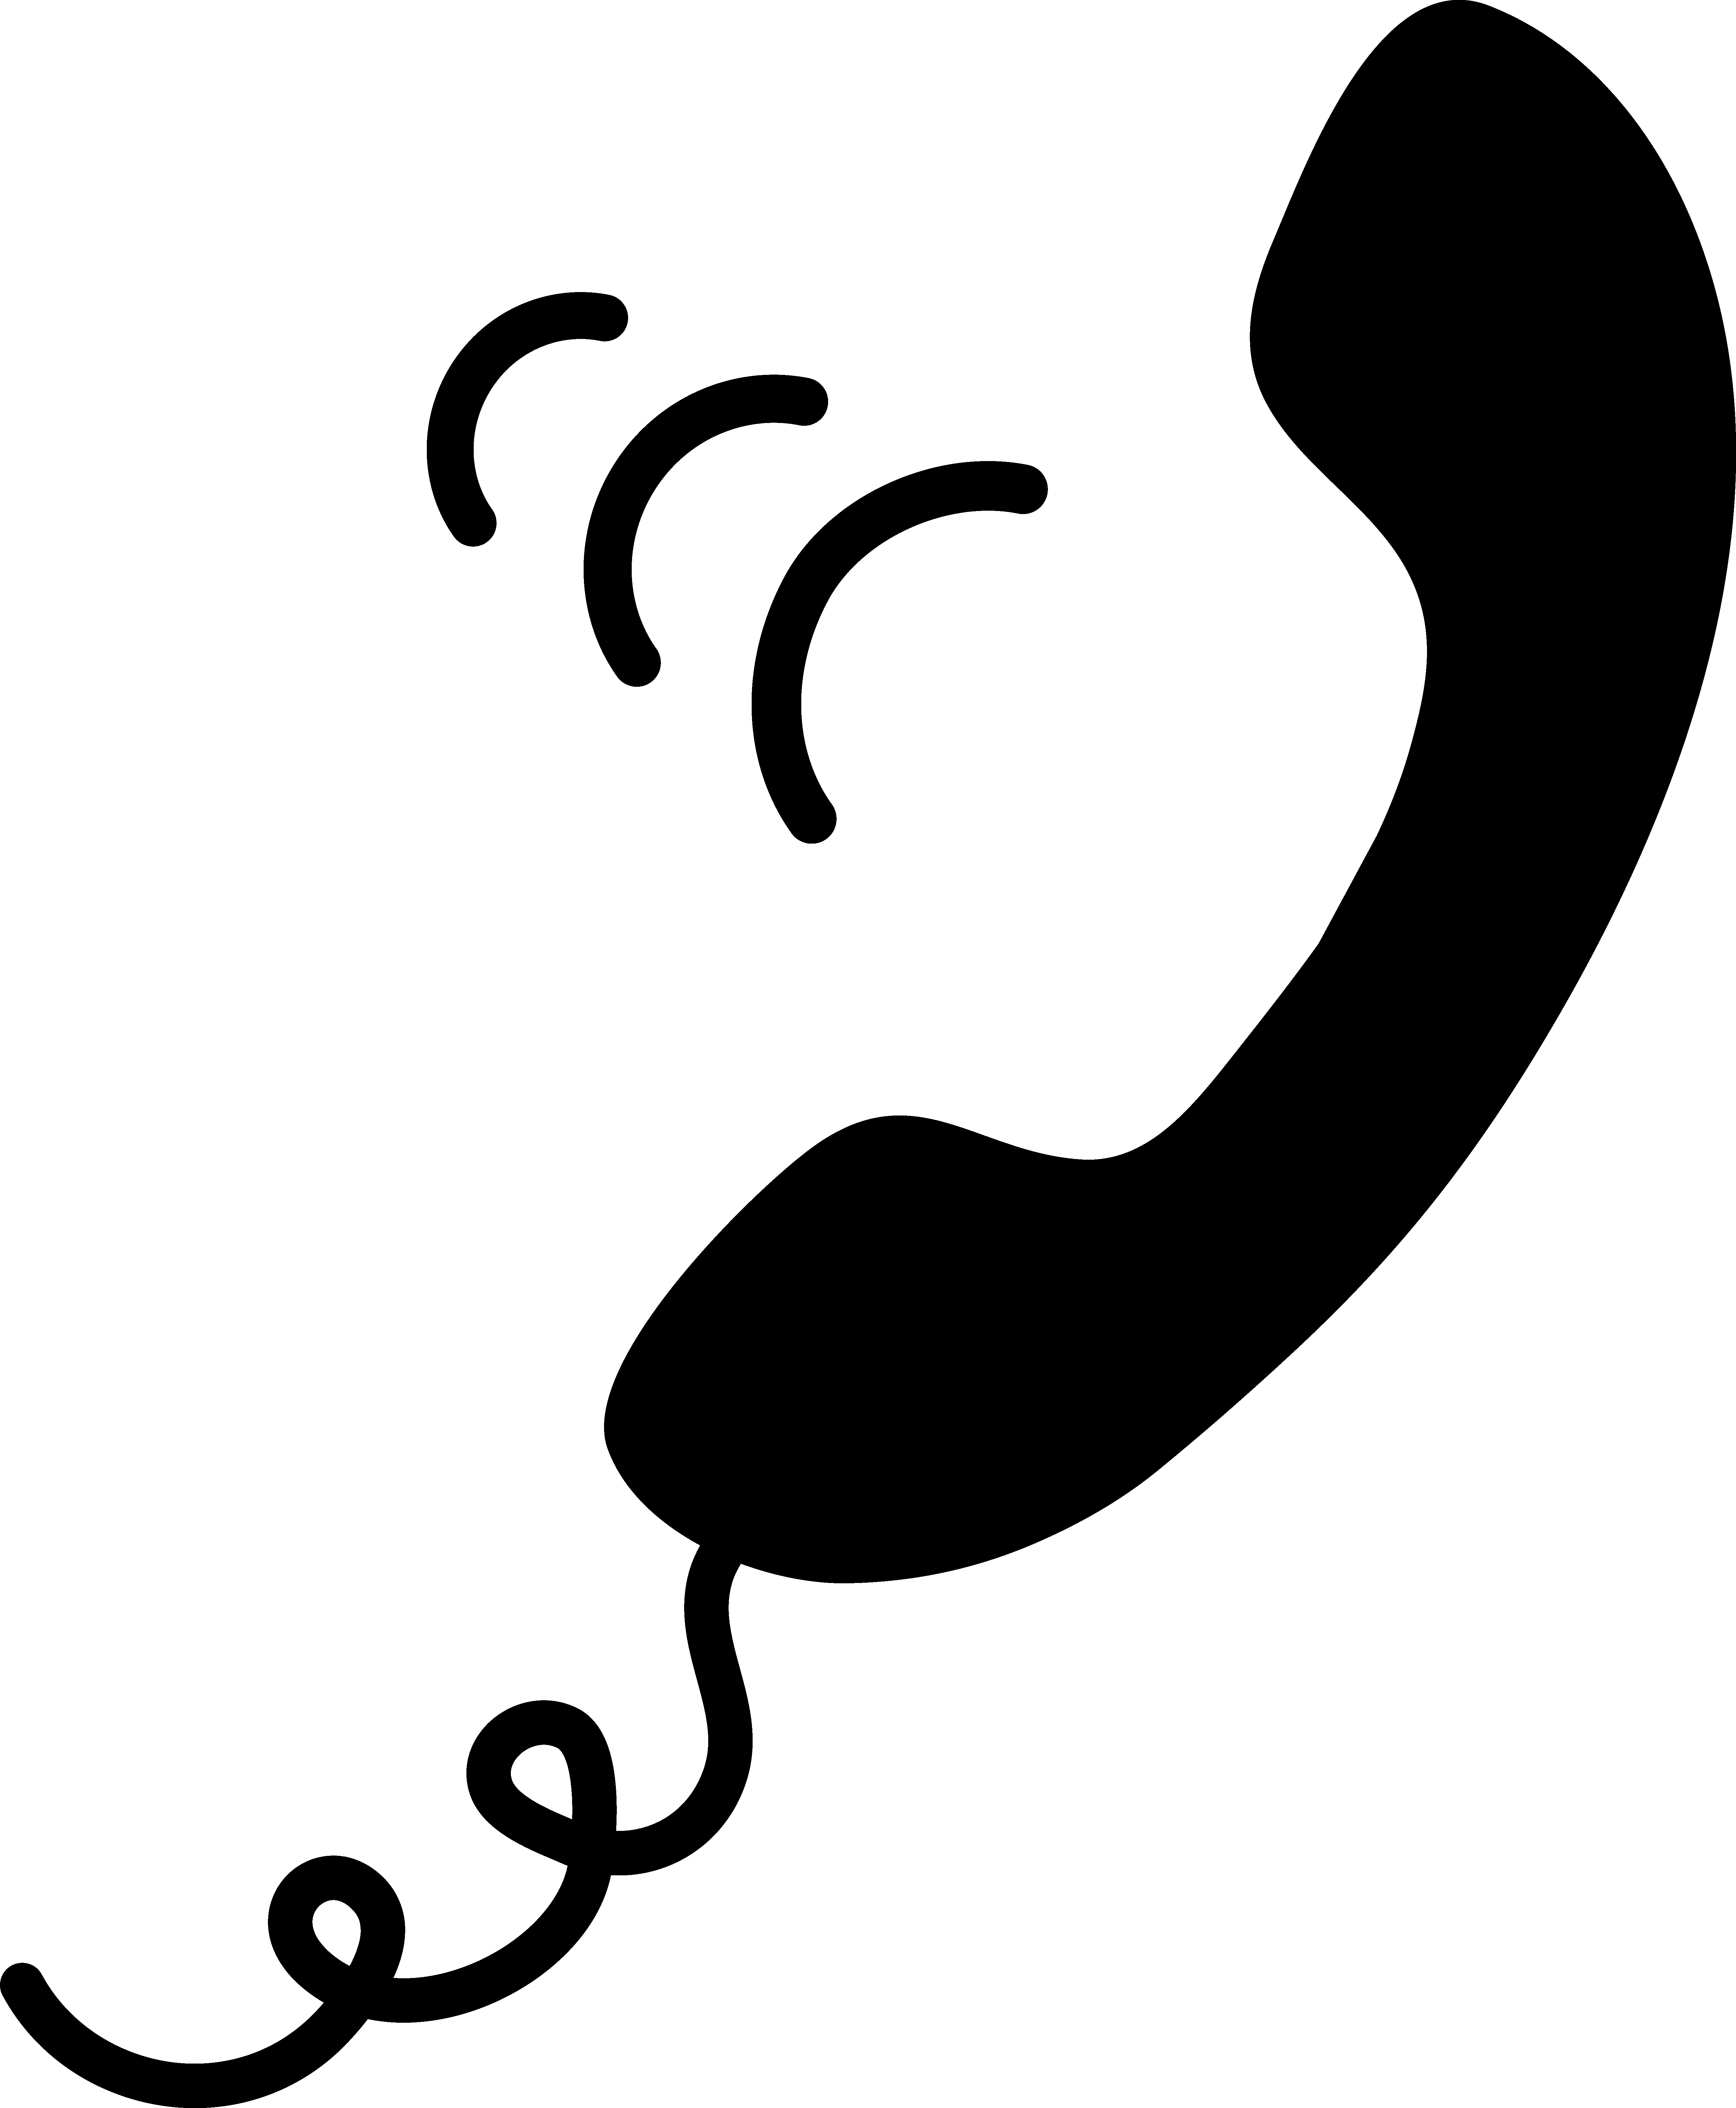 Phone Clip Art-Phone Clip Art-1